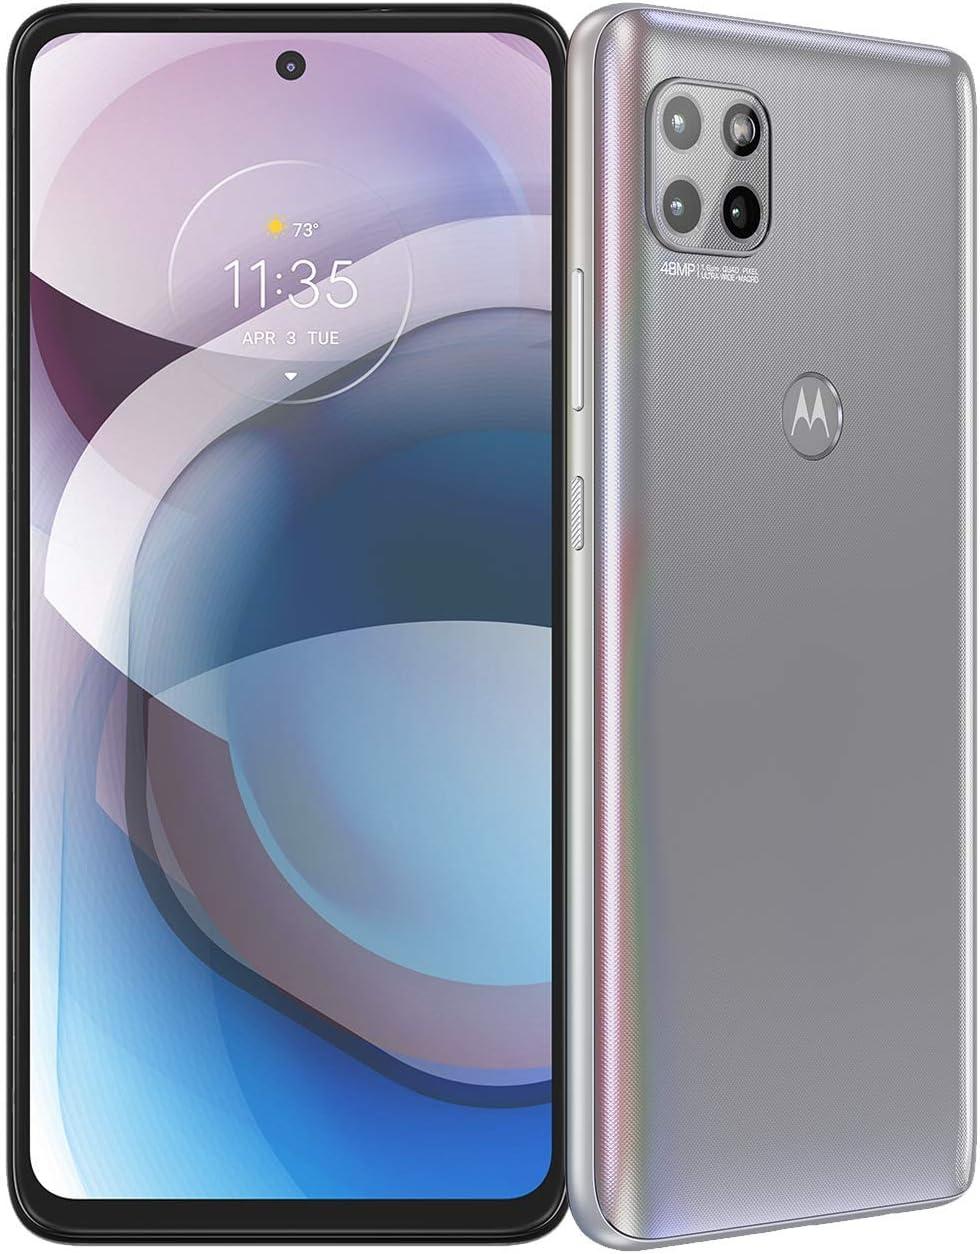 Motorola One 5G Ace | 2021 | 2-Day Battery | Unlocked | Made for US by Motorola | 6/128GB | 48MP Camera | Hazy Silver